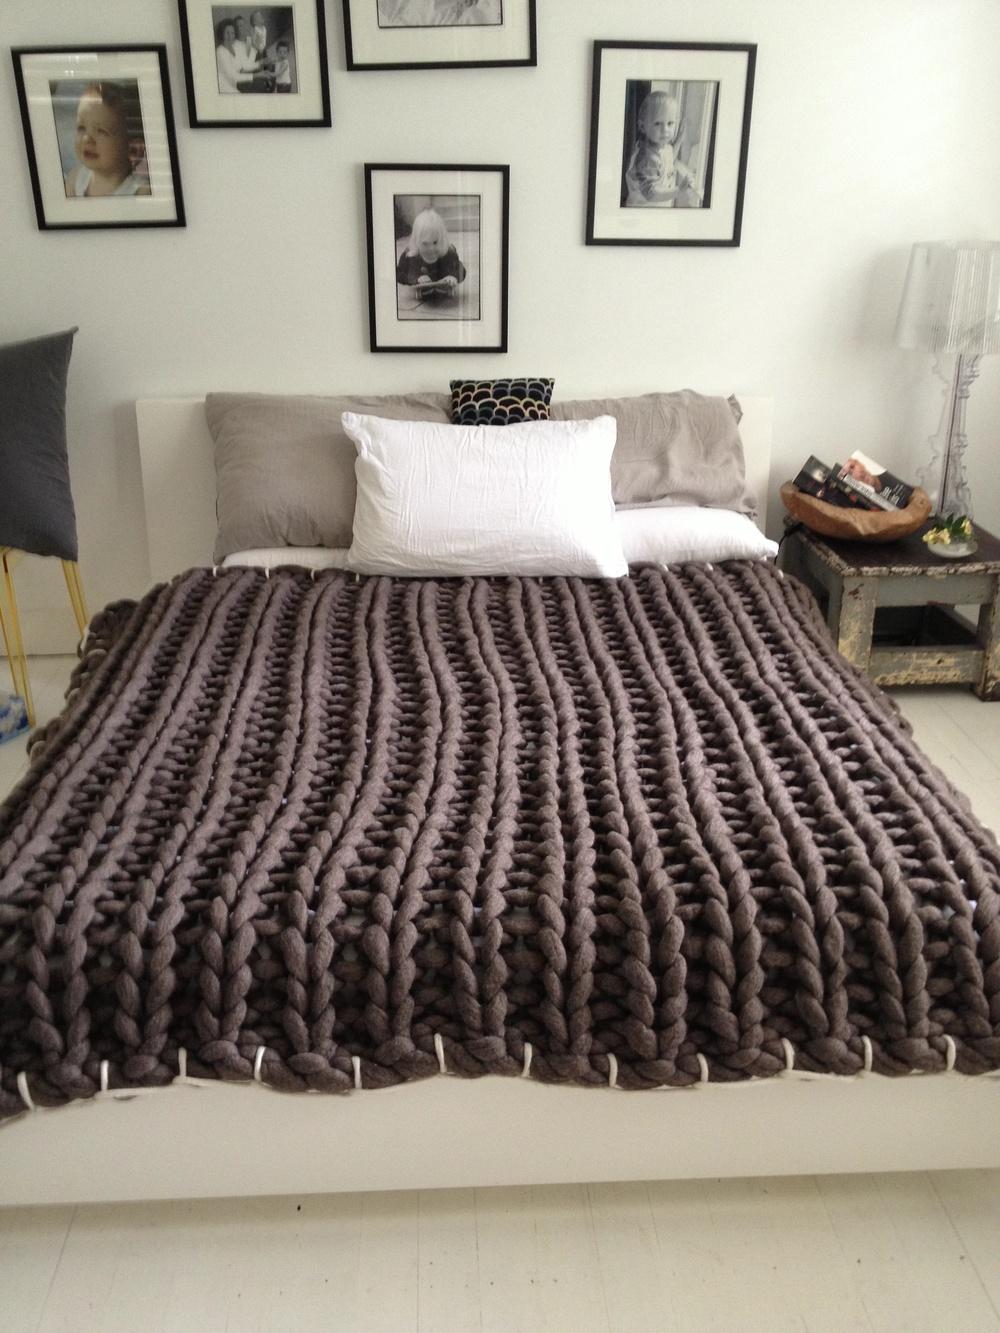 REal Living Grey blanket pic no filter.jpg